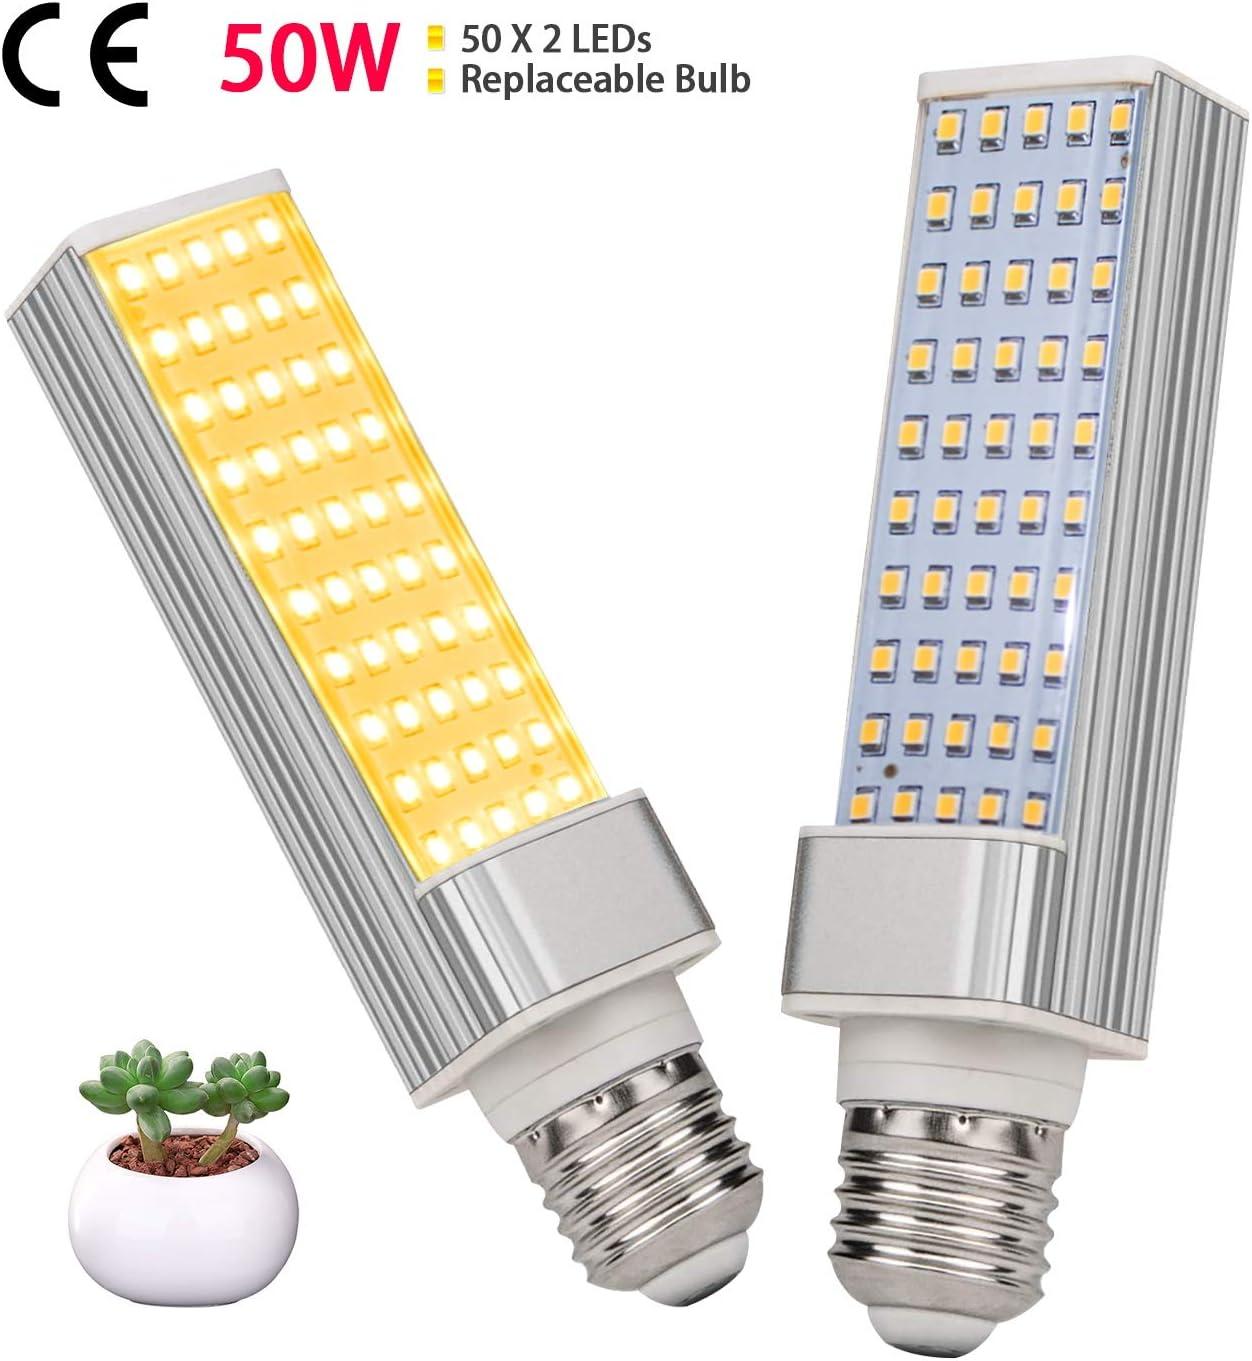 LED Grow Light for Indoor Plants, KINGBO 50W Sunlike Full Spectrum Grow Lamp, LED Grow Lamp for Indoor Garden Seedling Growing 2PCS Plant Growing Light Bulb